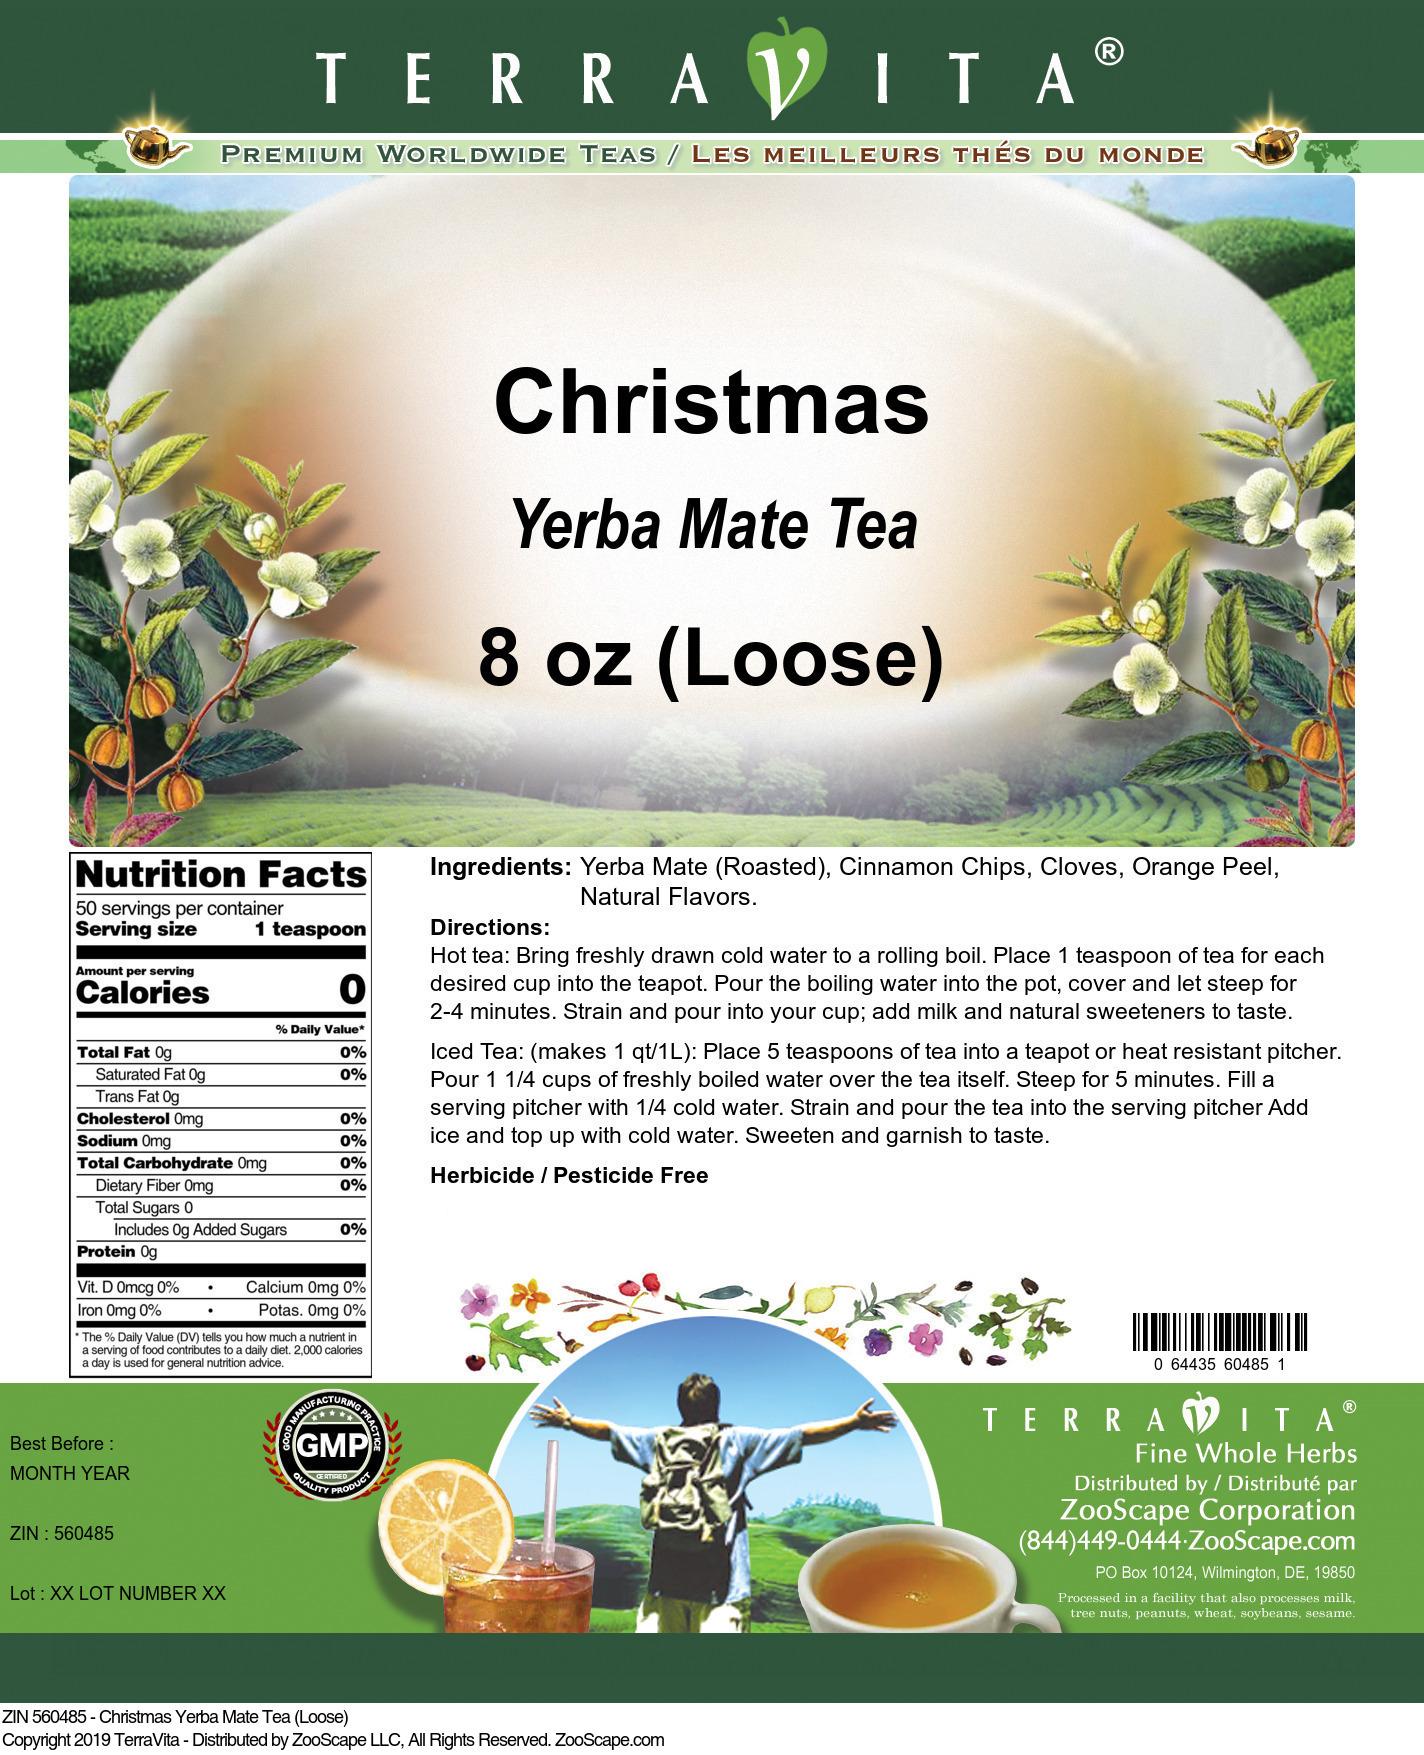 Christmas Yerba Mate Tea (Loose)